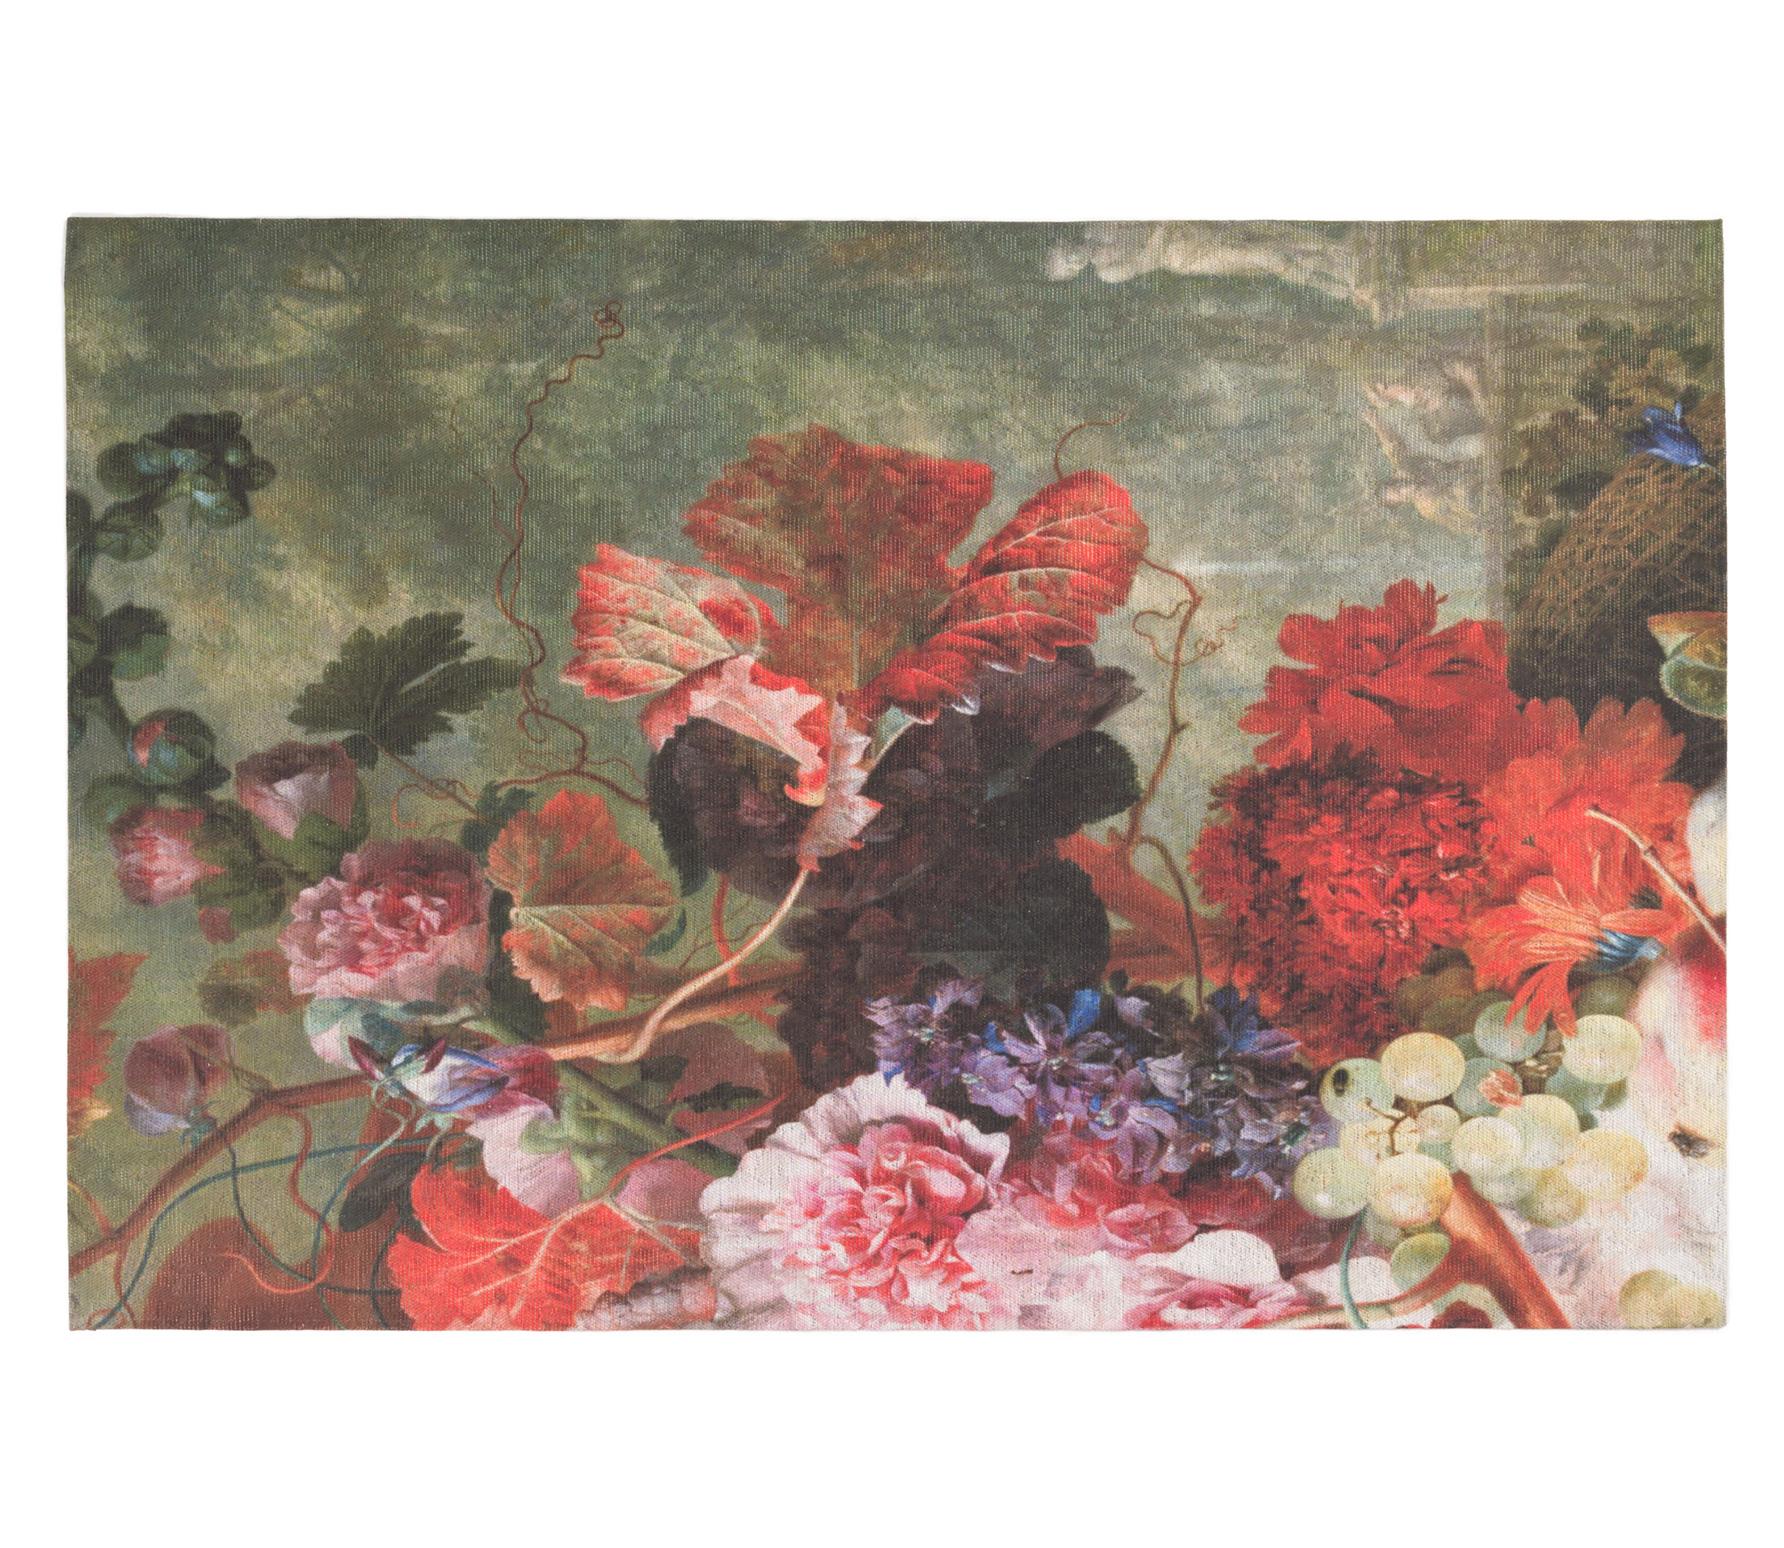 Solana vloerkleed multicolor div. afmetingen 155x230 cm